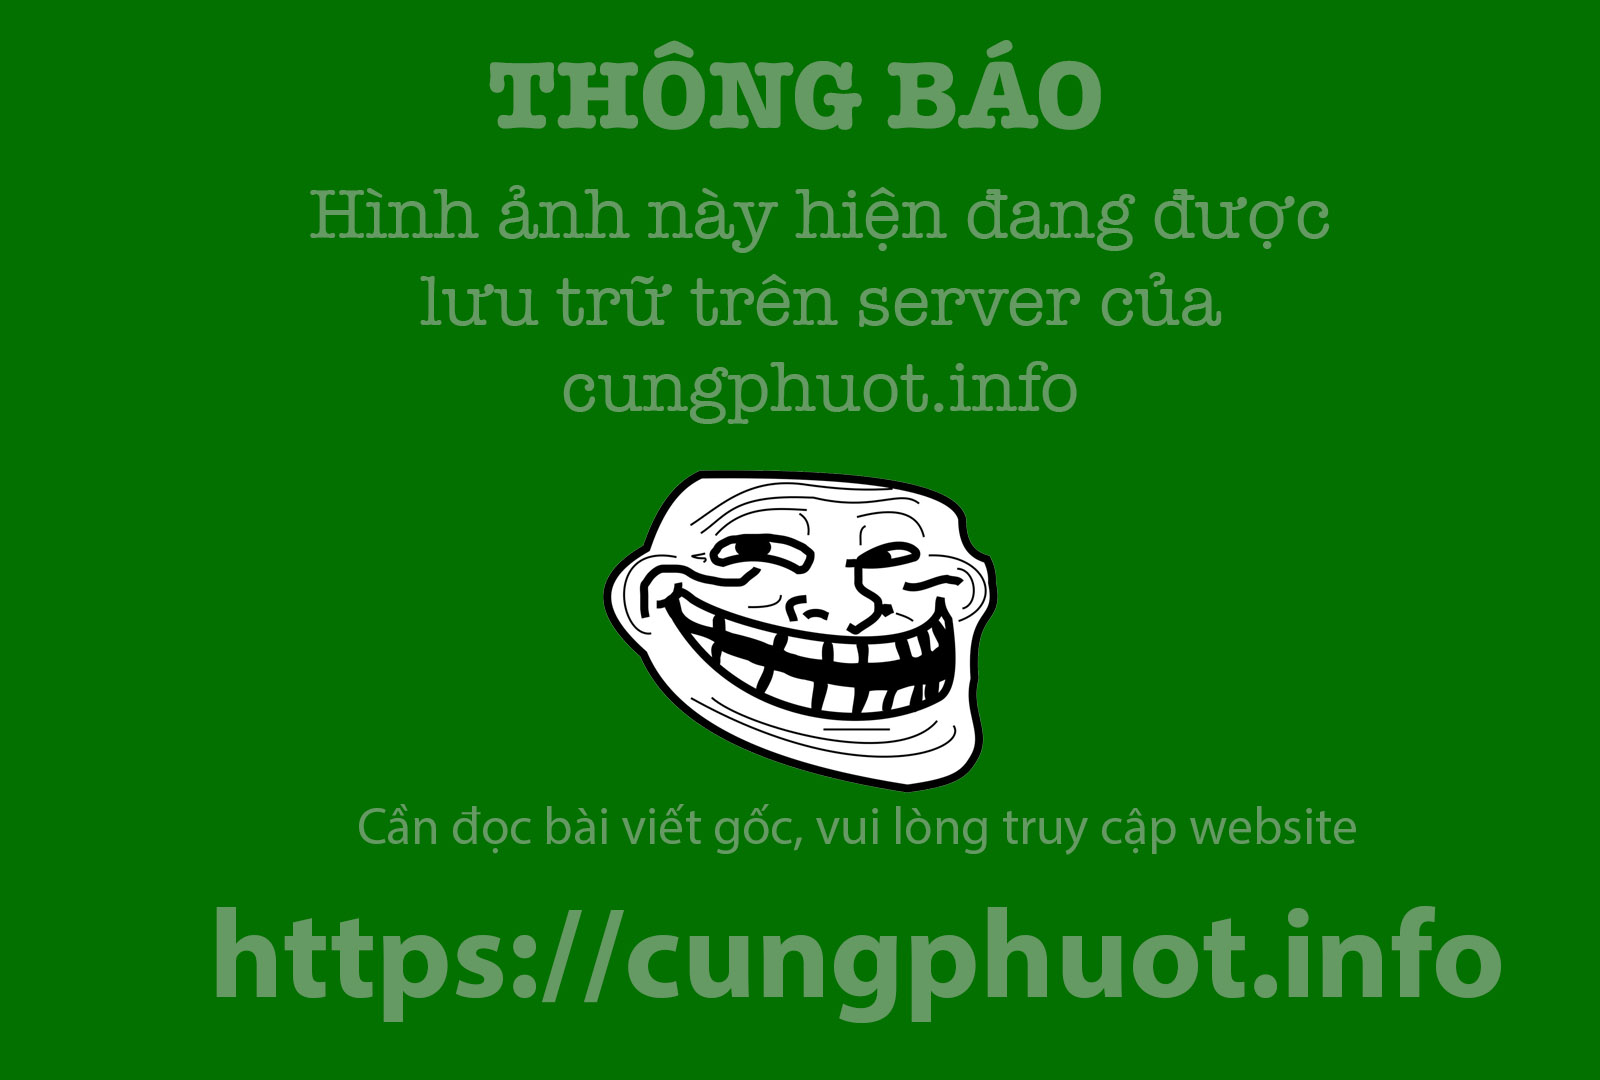 Den Moc Chau san mai anh dao hinh anh 5